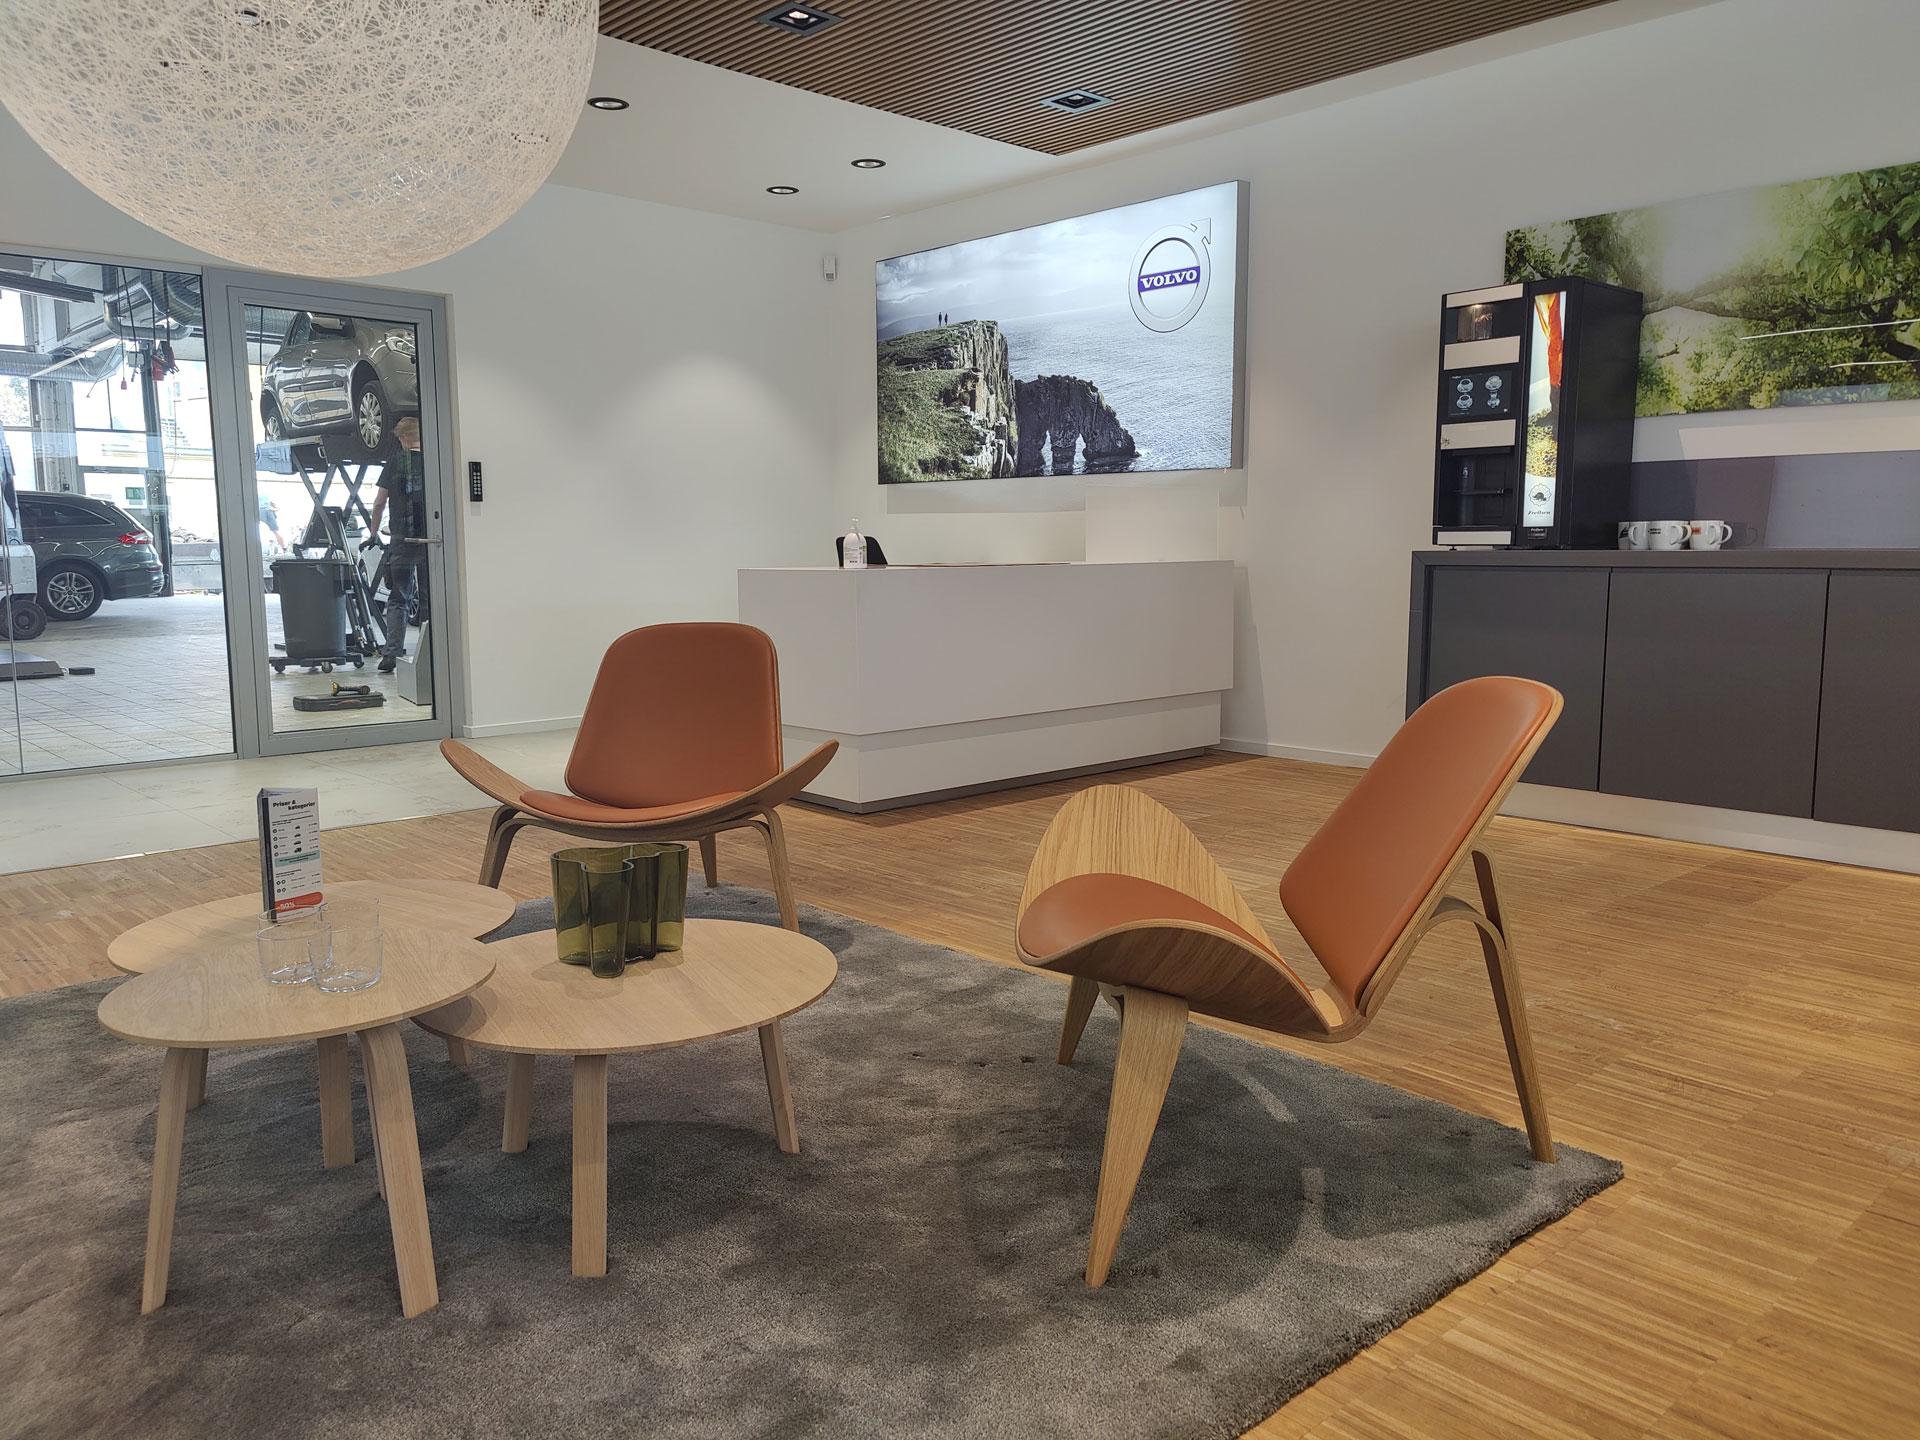 Volvo lounge hos Andersen Biler Gladsaxe 3